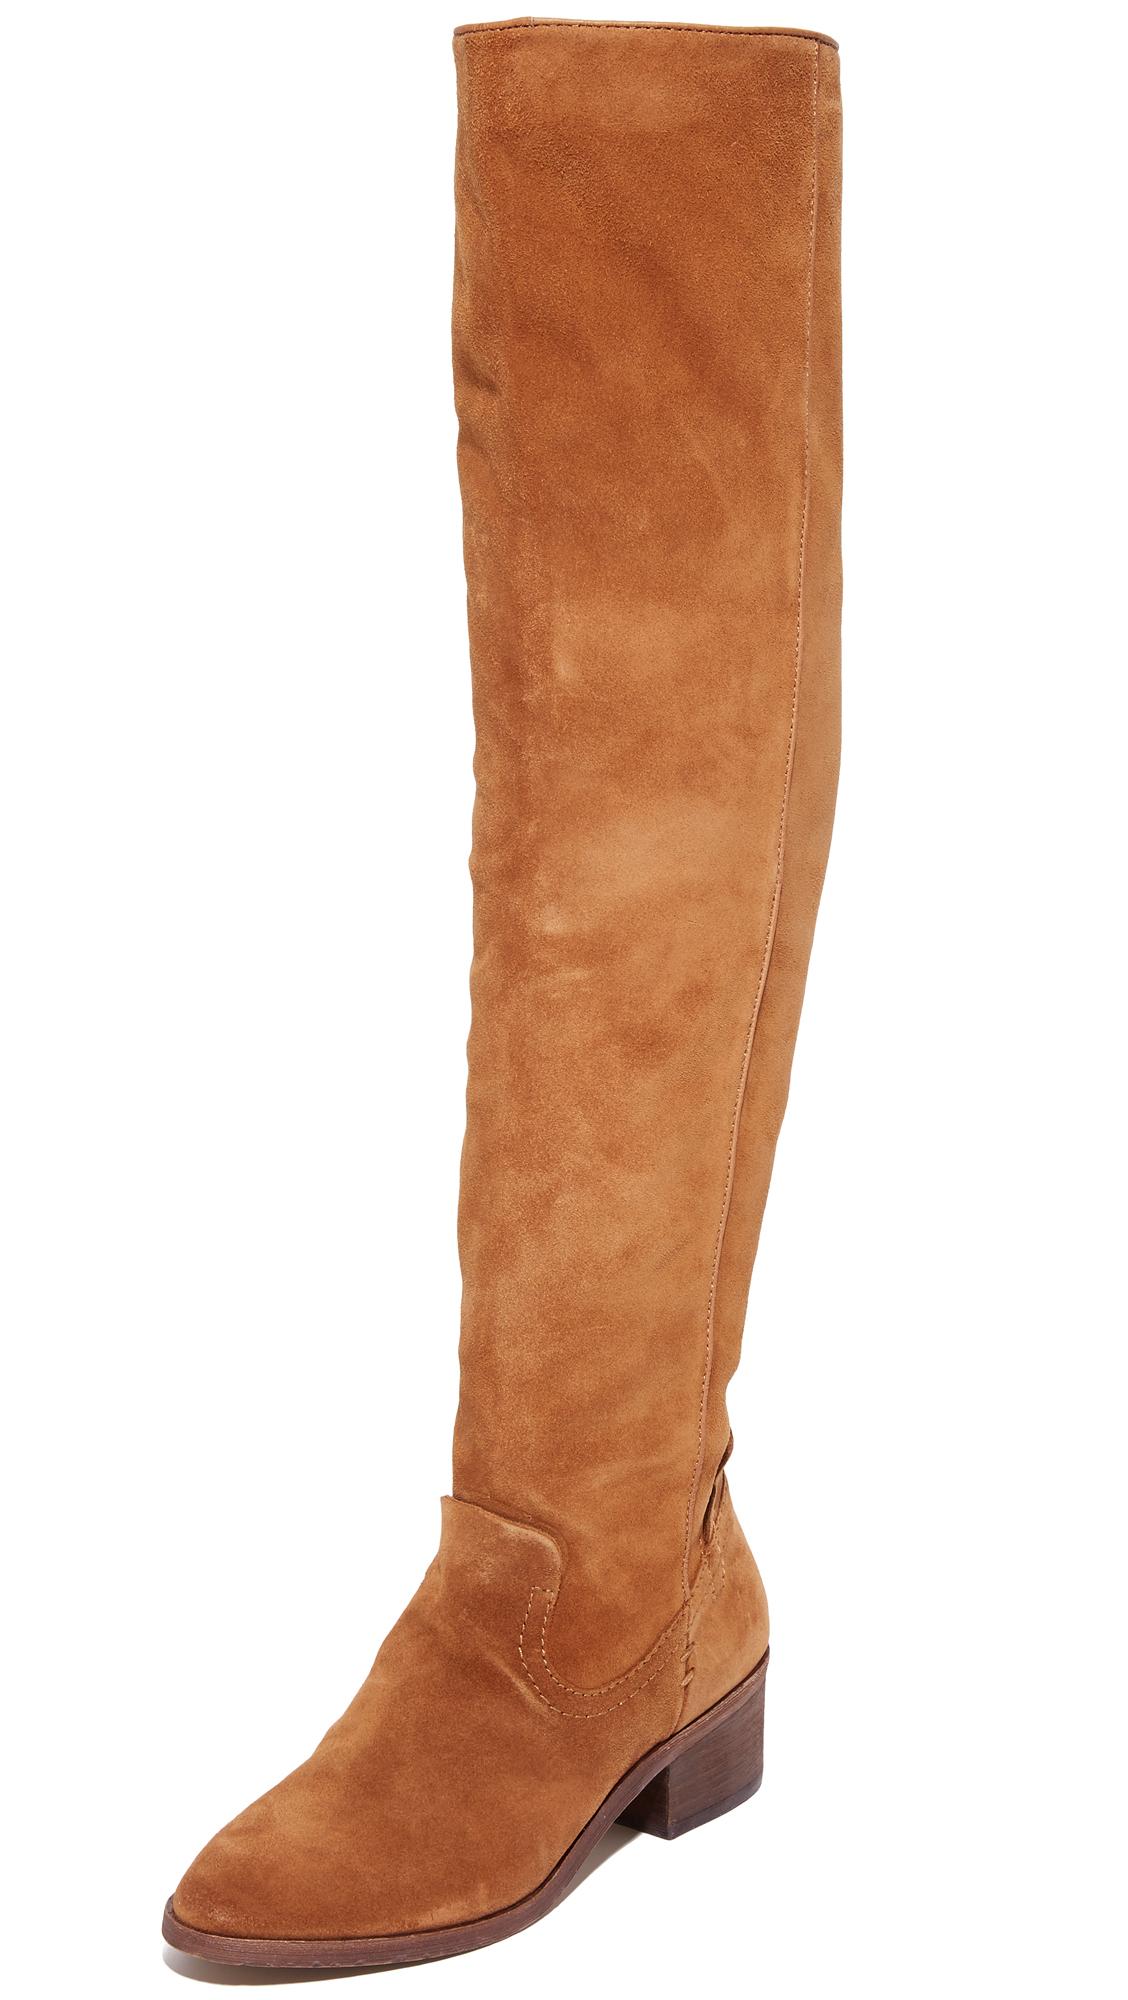 Dolce Vita Kitt Over The Knee Boots - Dark Saddle